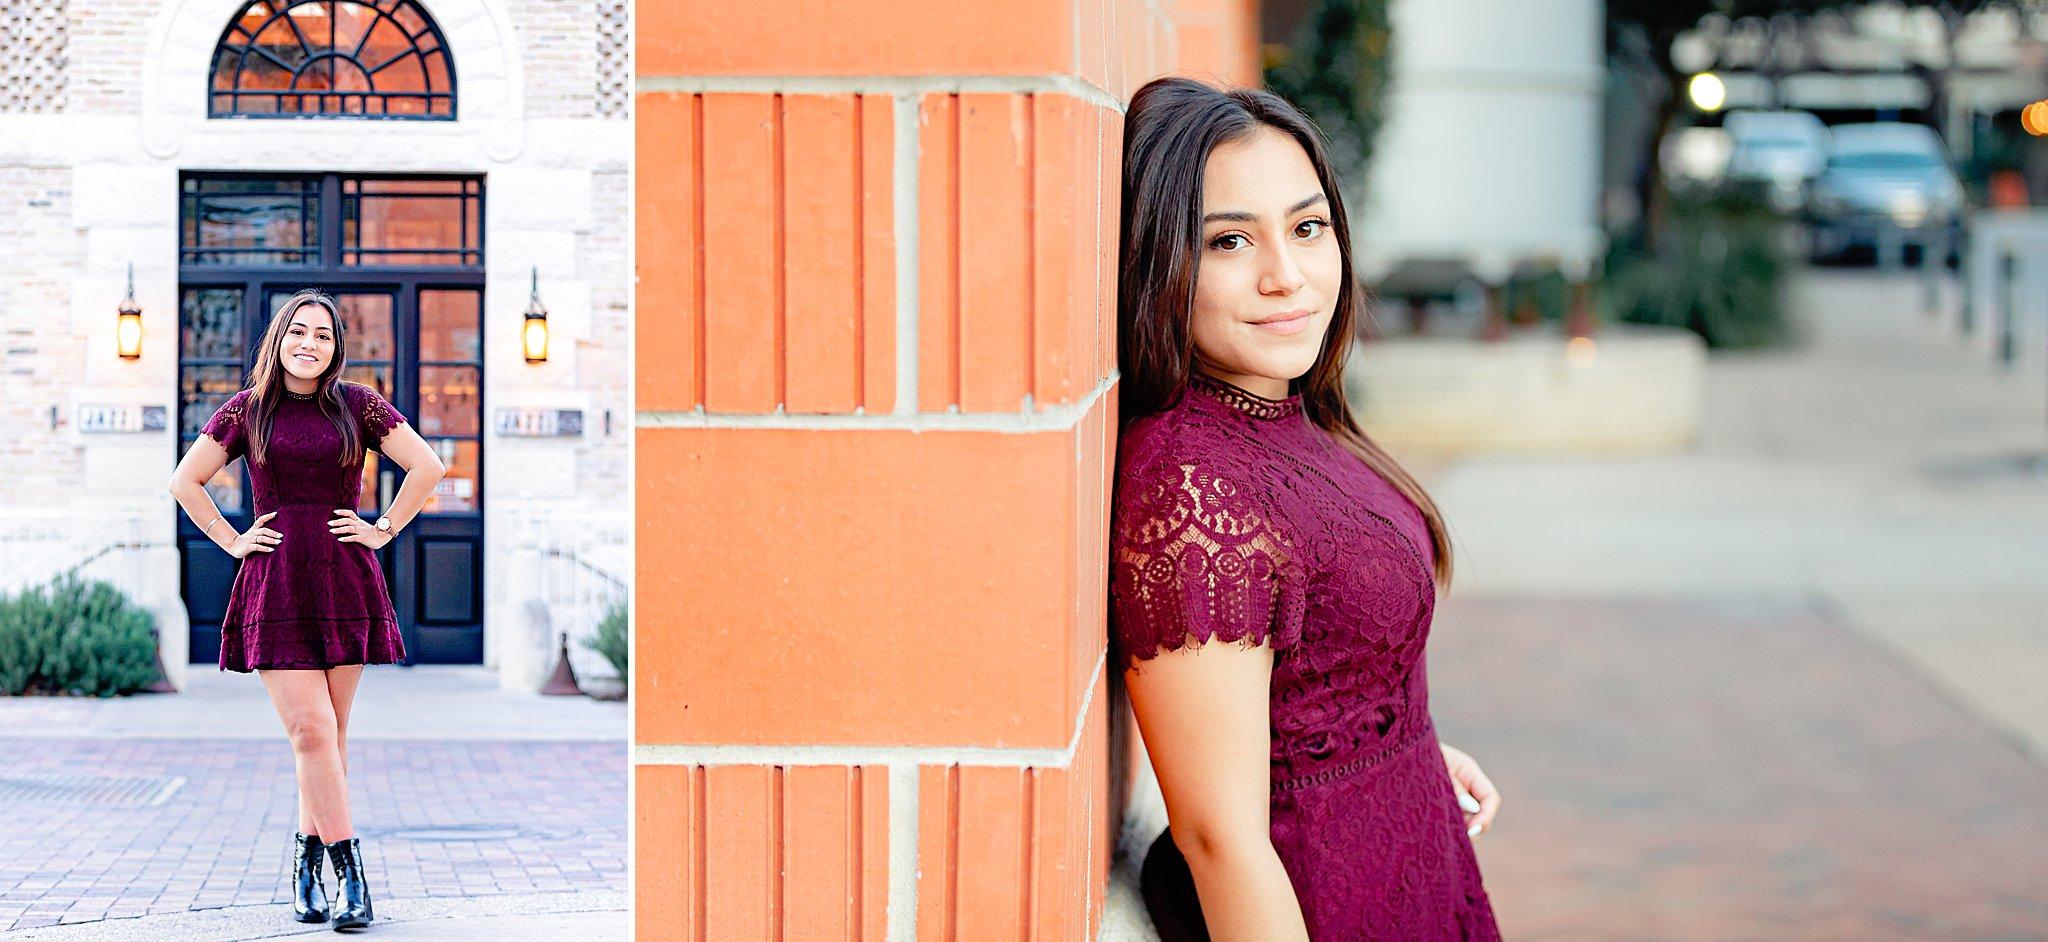 Carly-Barton-Photography-Texas-Photographer-High-School-Senior-Photos-The-Historic-Pearl-San-Antonio_0005.jpg